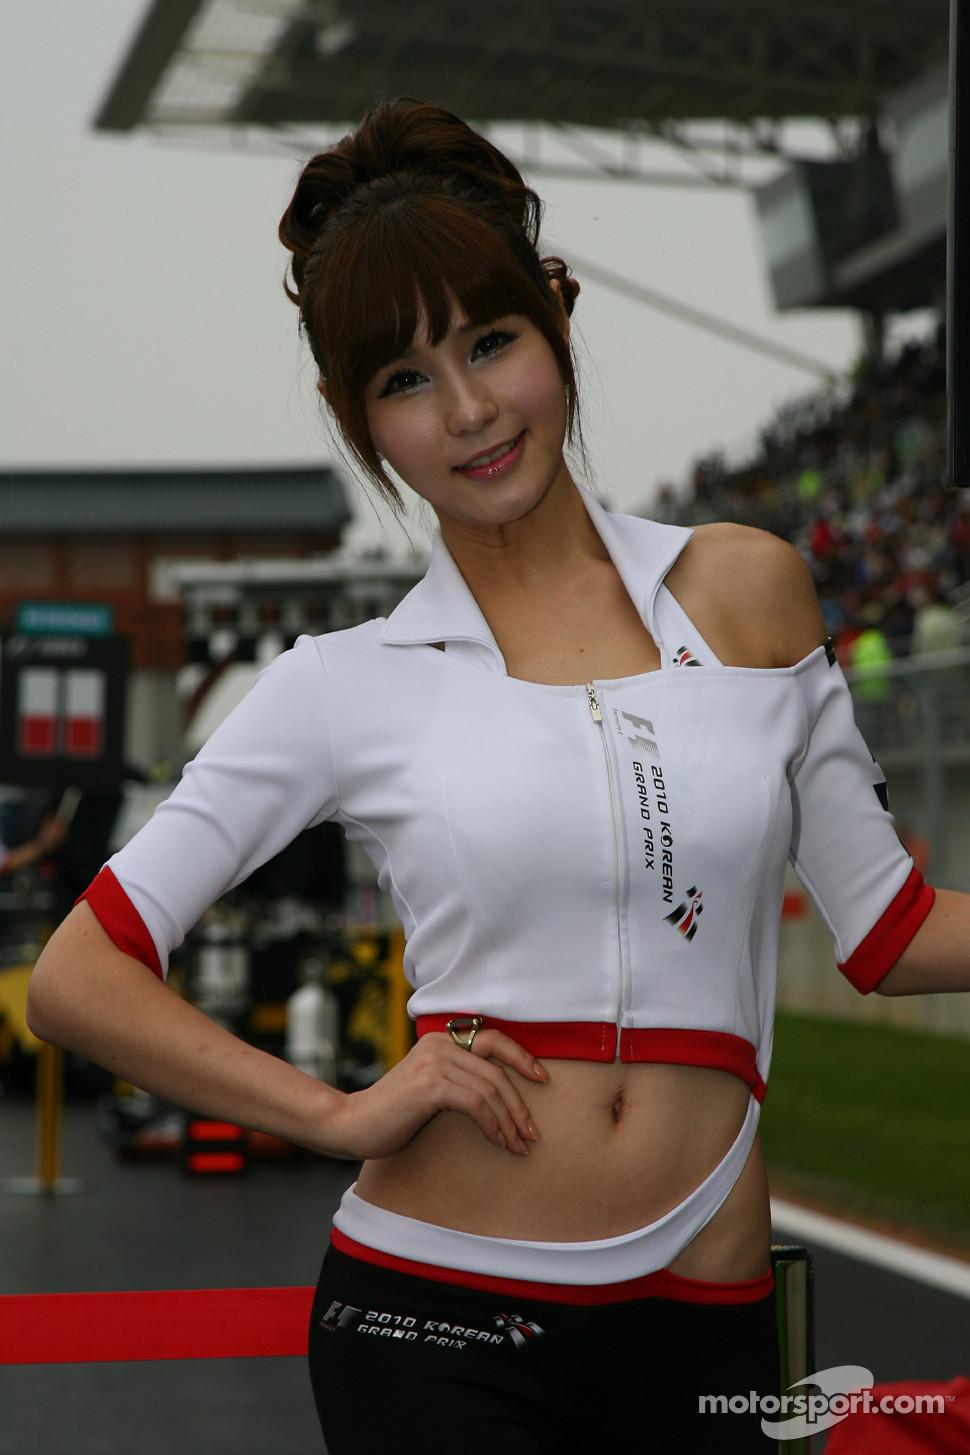 Фото красивой кореянки 5 фотография